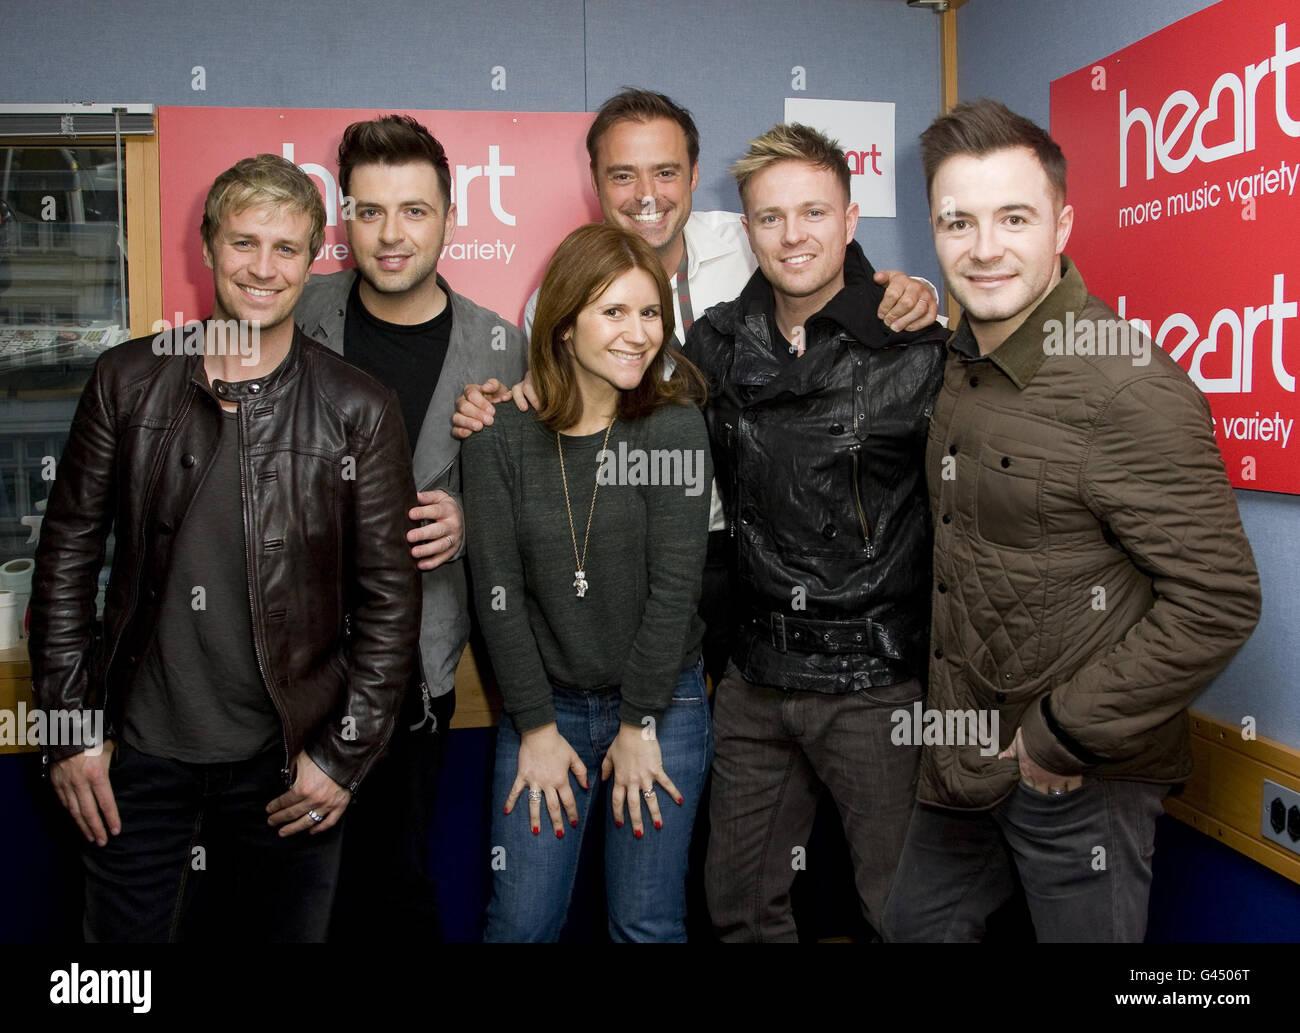 Westlife visit Heart FM - London Stock Photo: 105830784 - Alamy